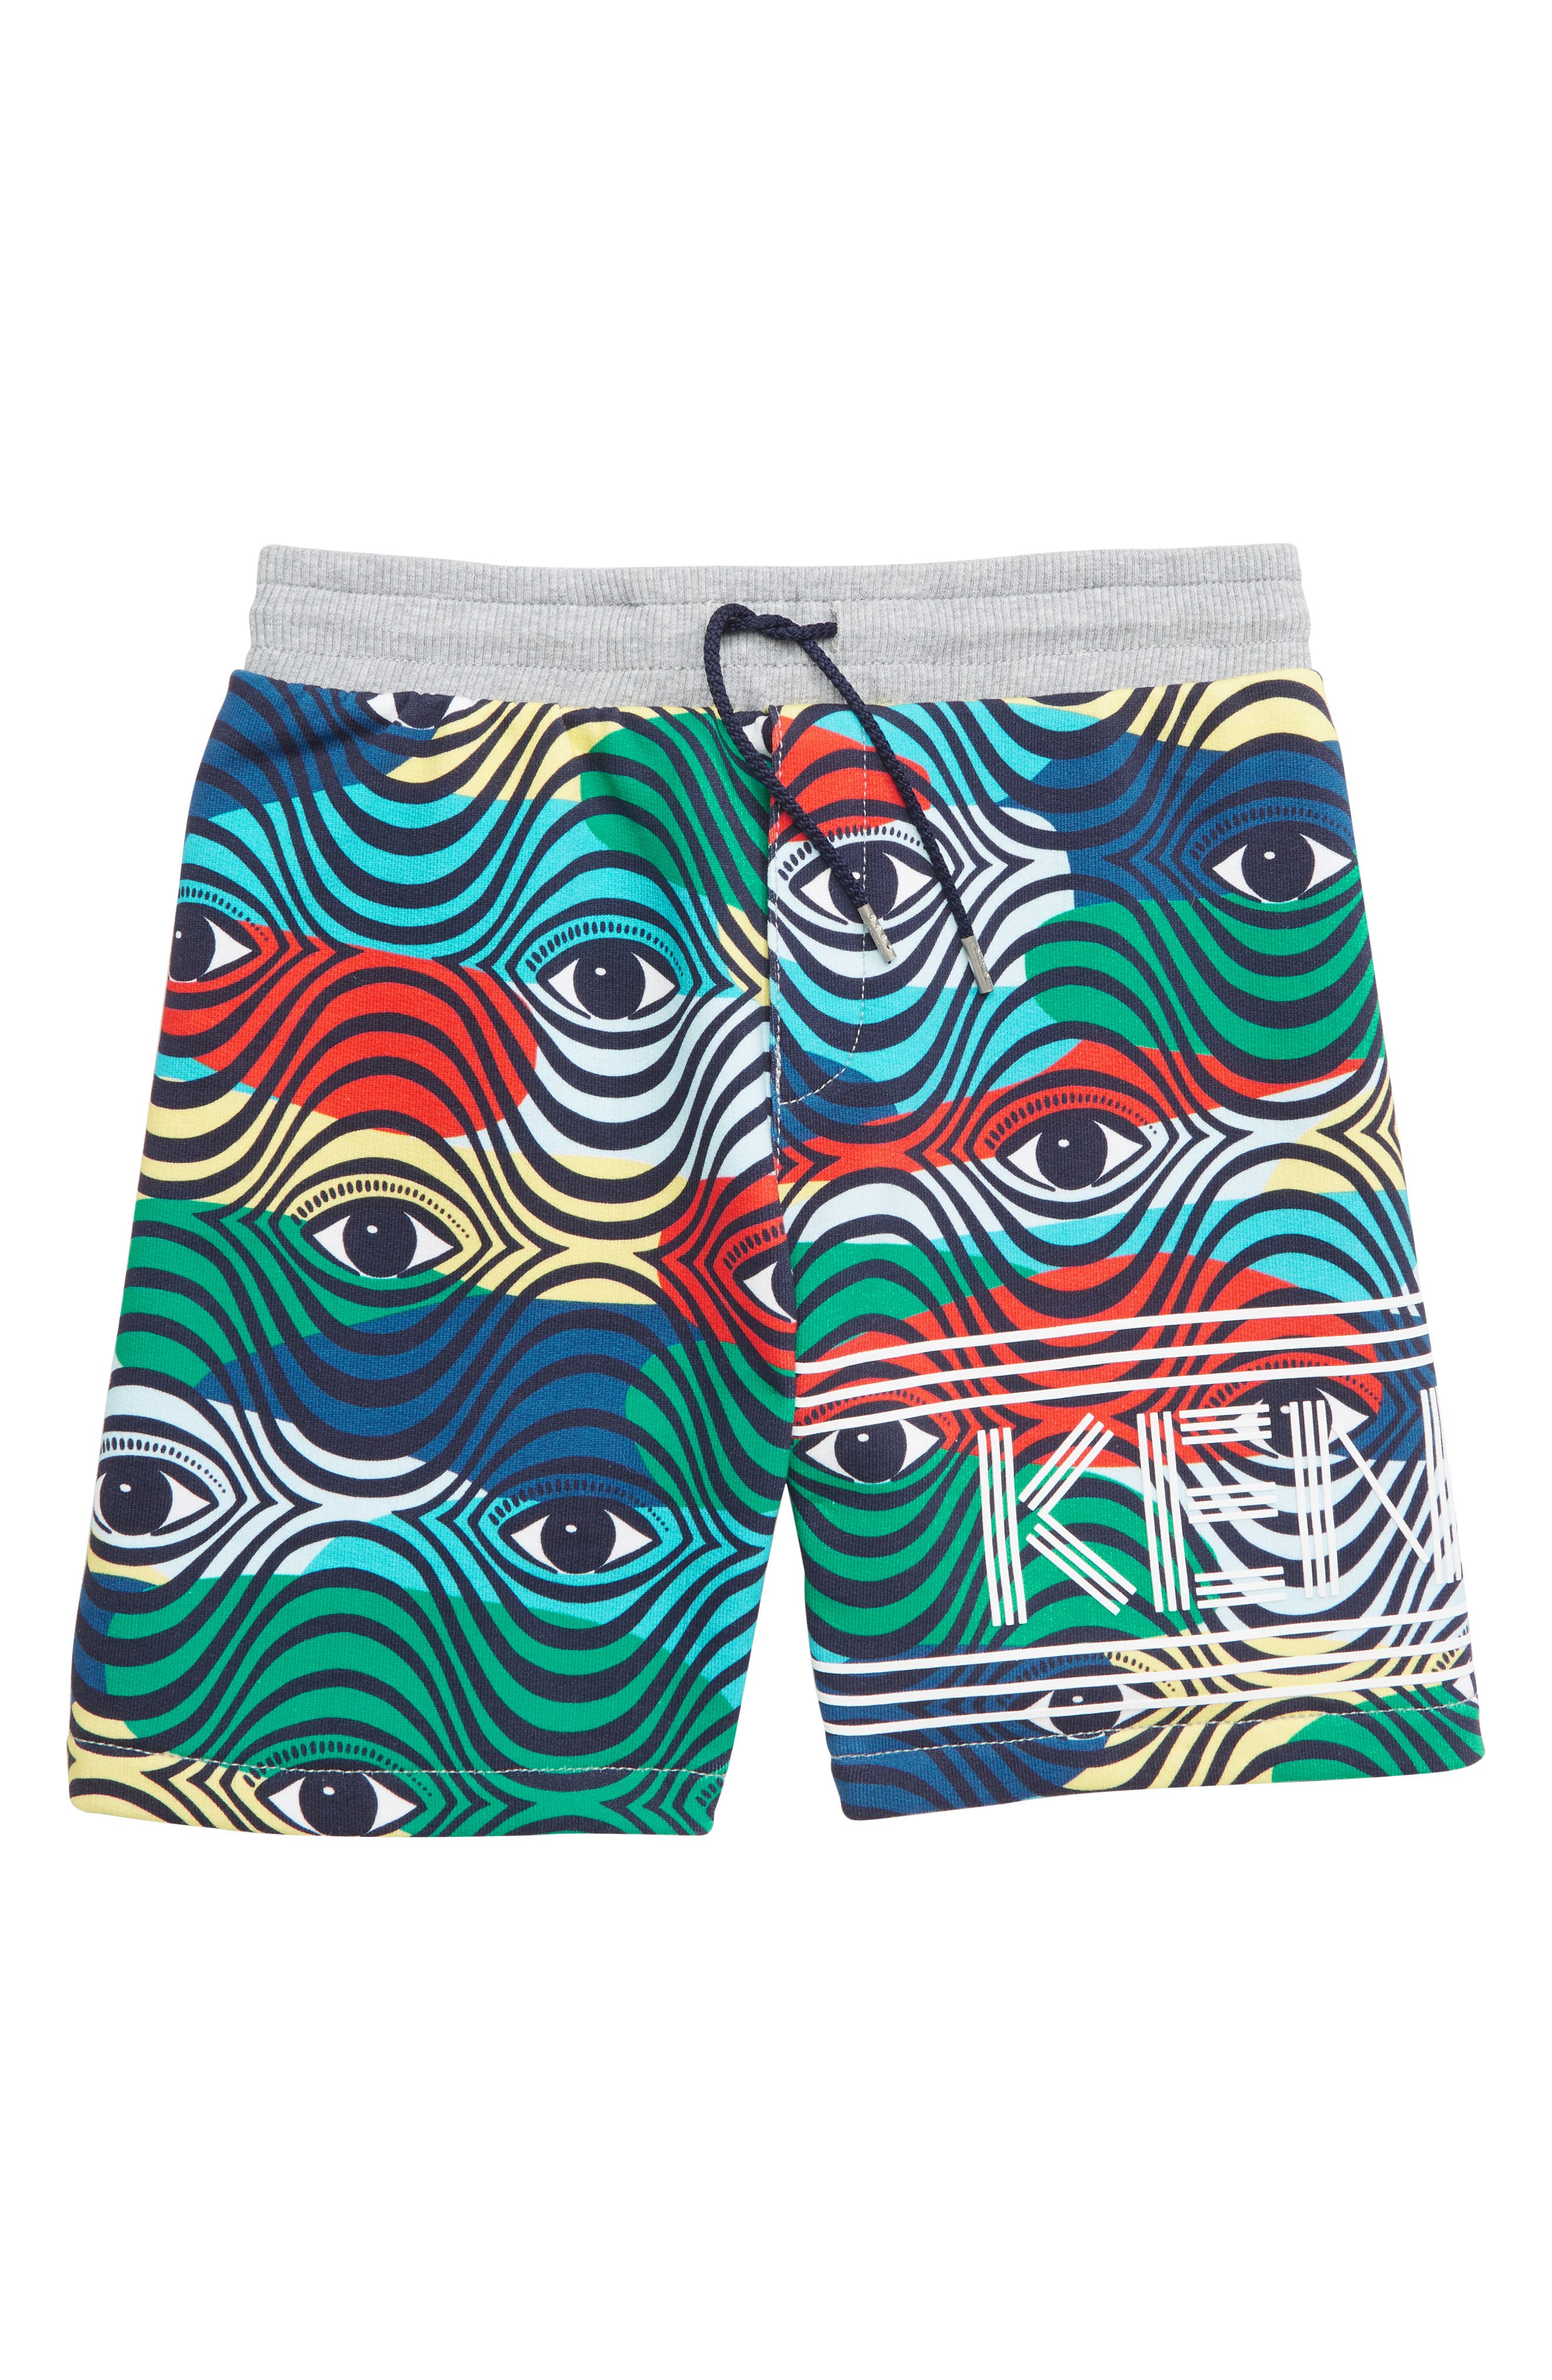 KENZO Print Fleece Bermuda Shorts, Main, color, MULTICOLORED